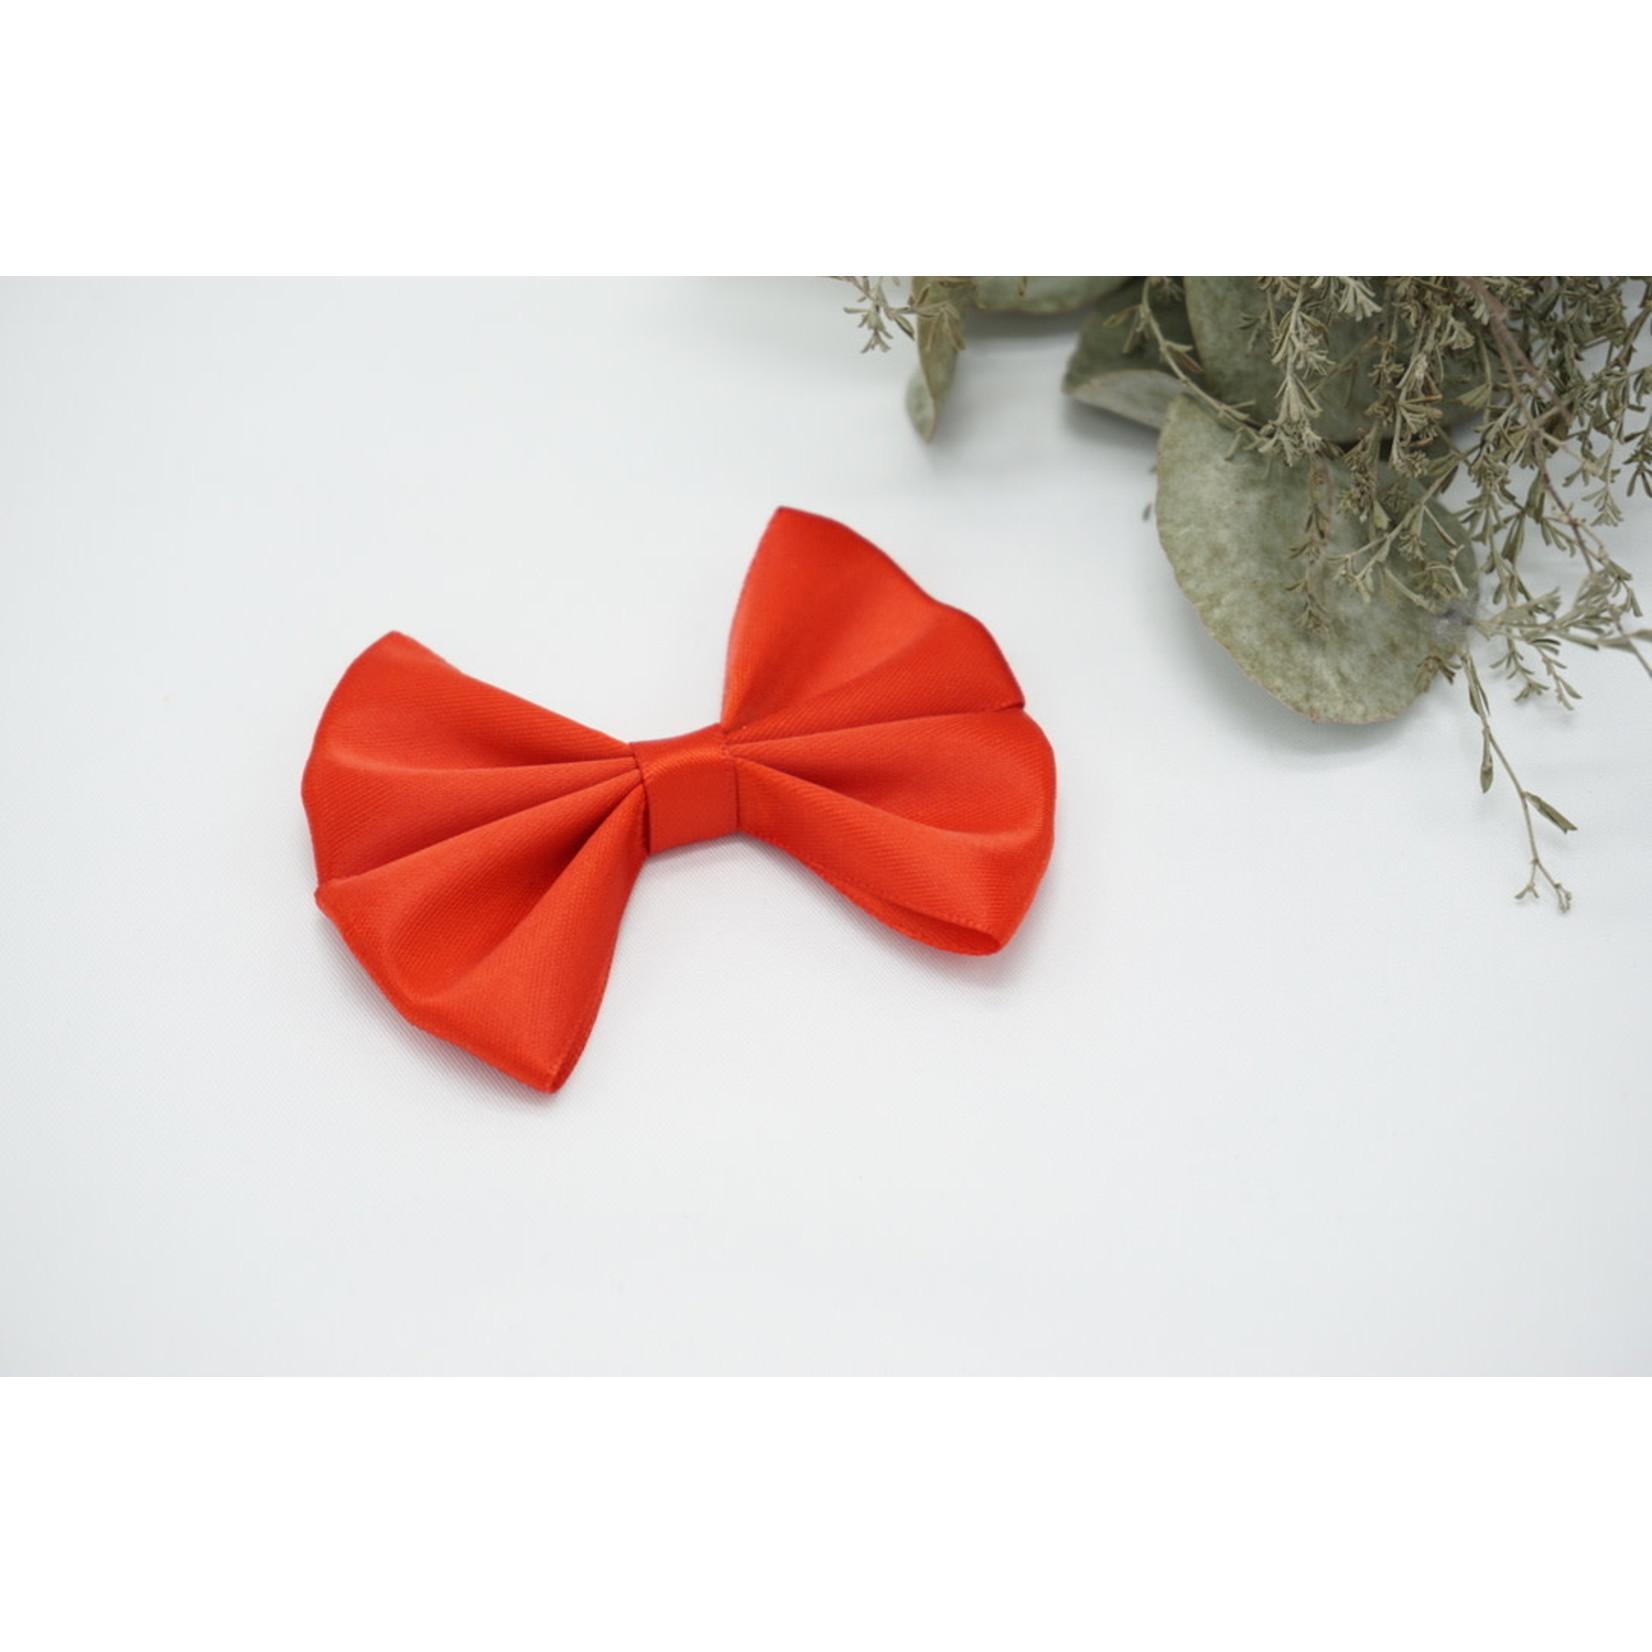 Petite Zara Satin Bow - Red